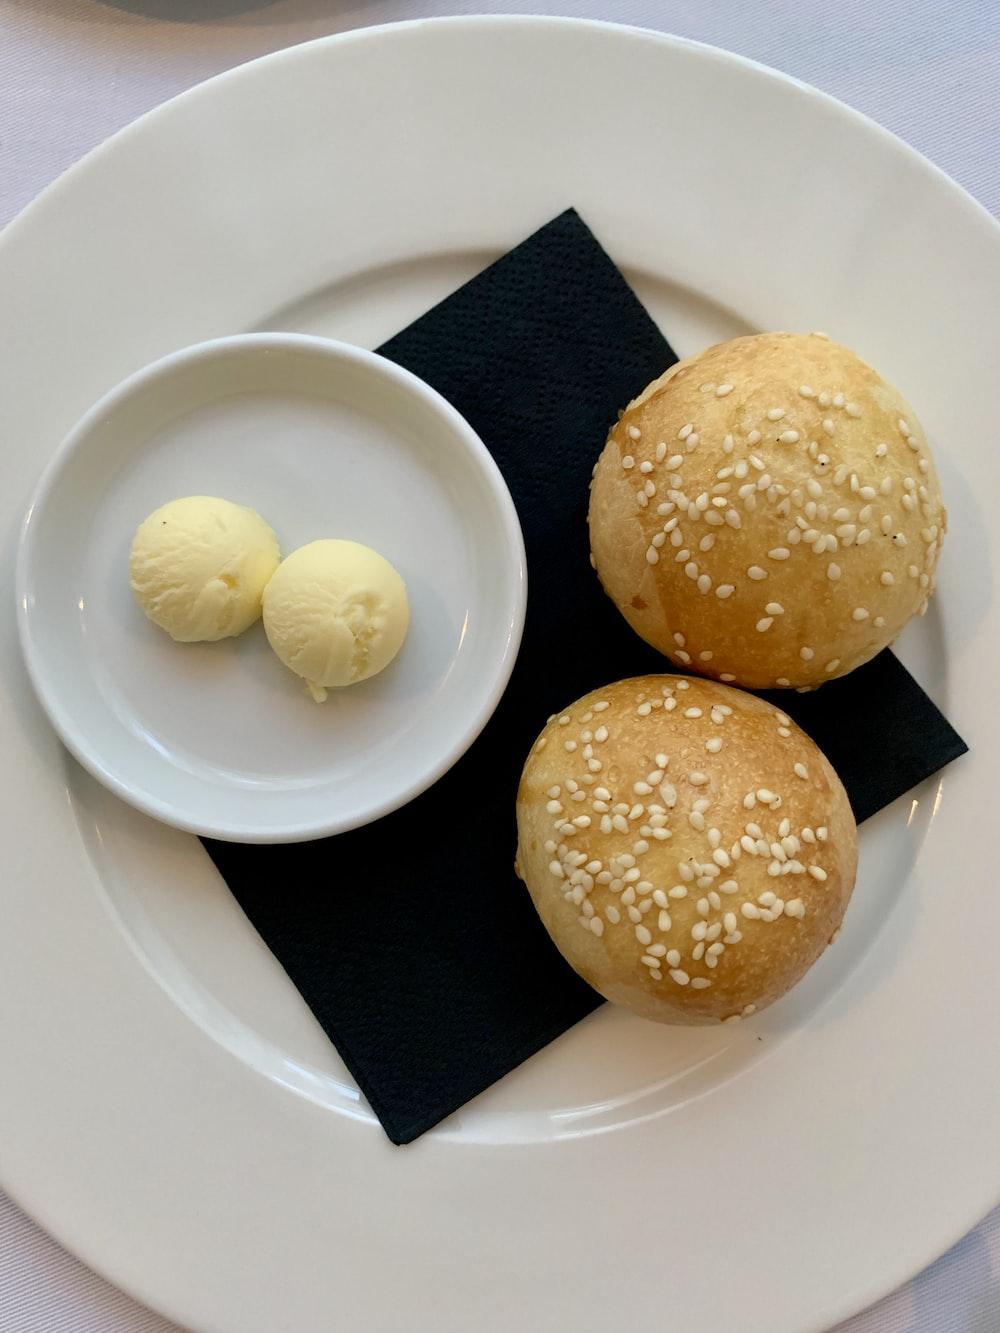 baked bread on white plat